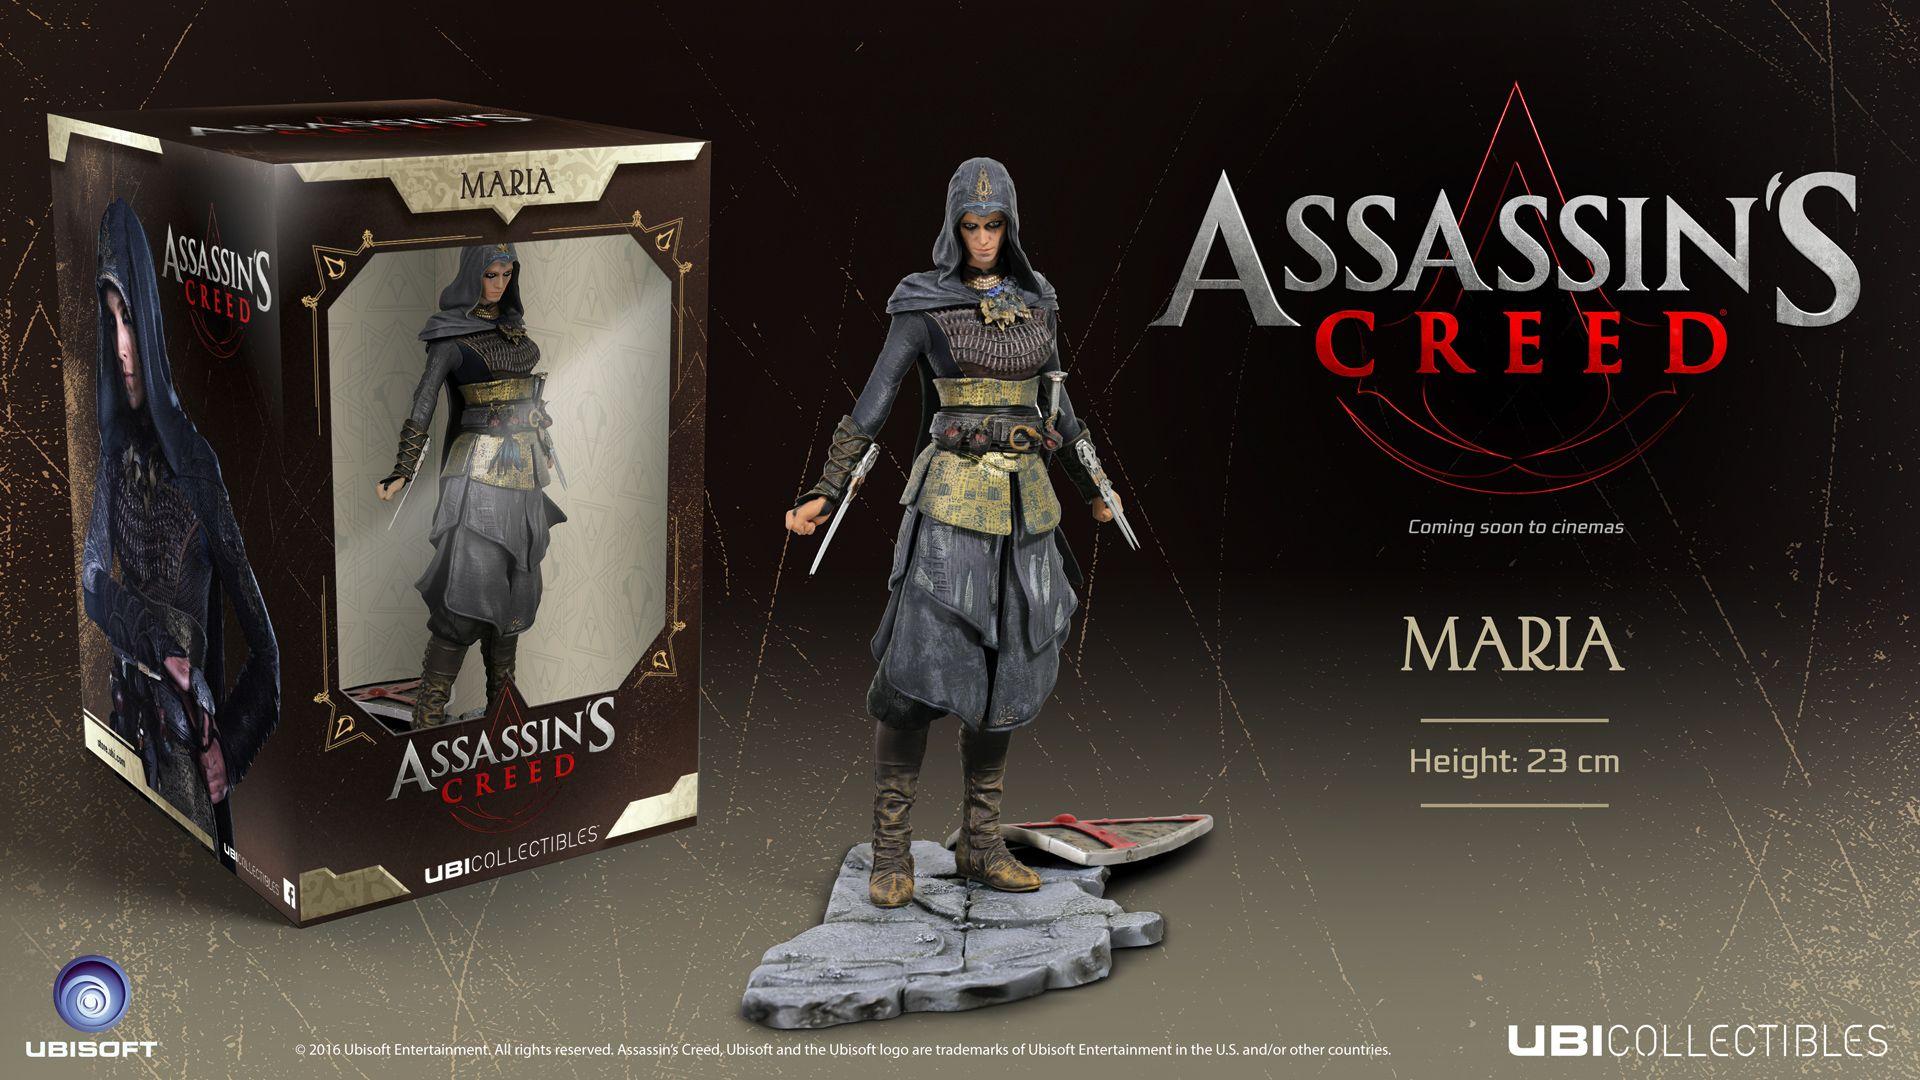 Assassin's Creed Maria